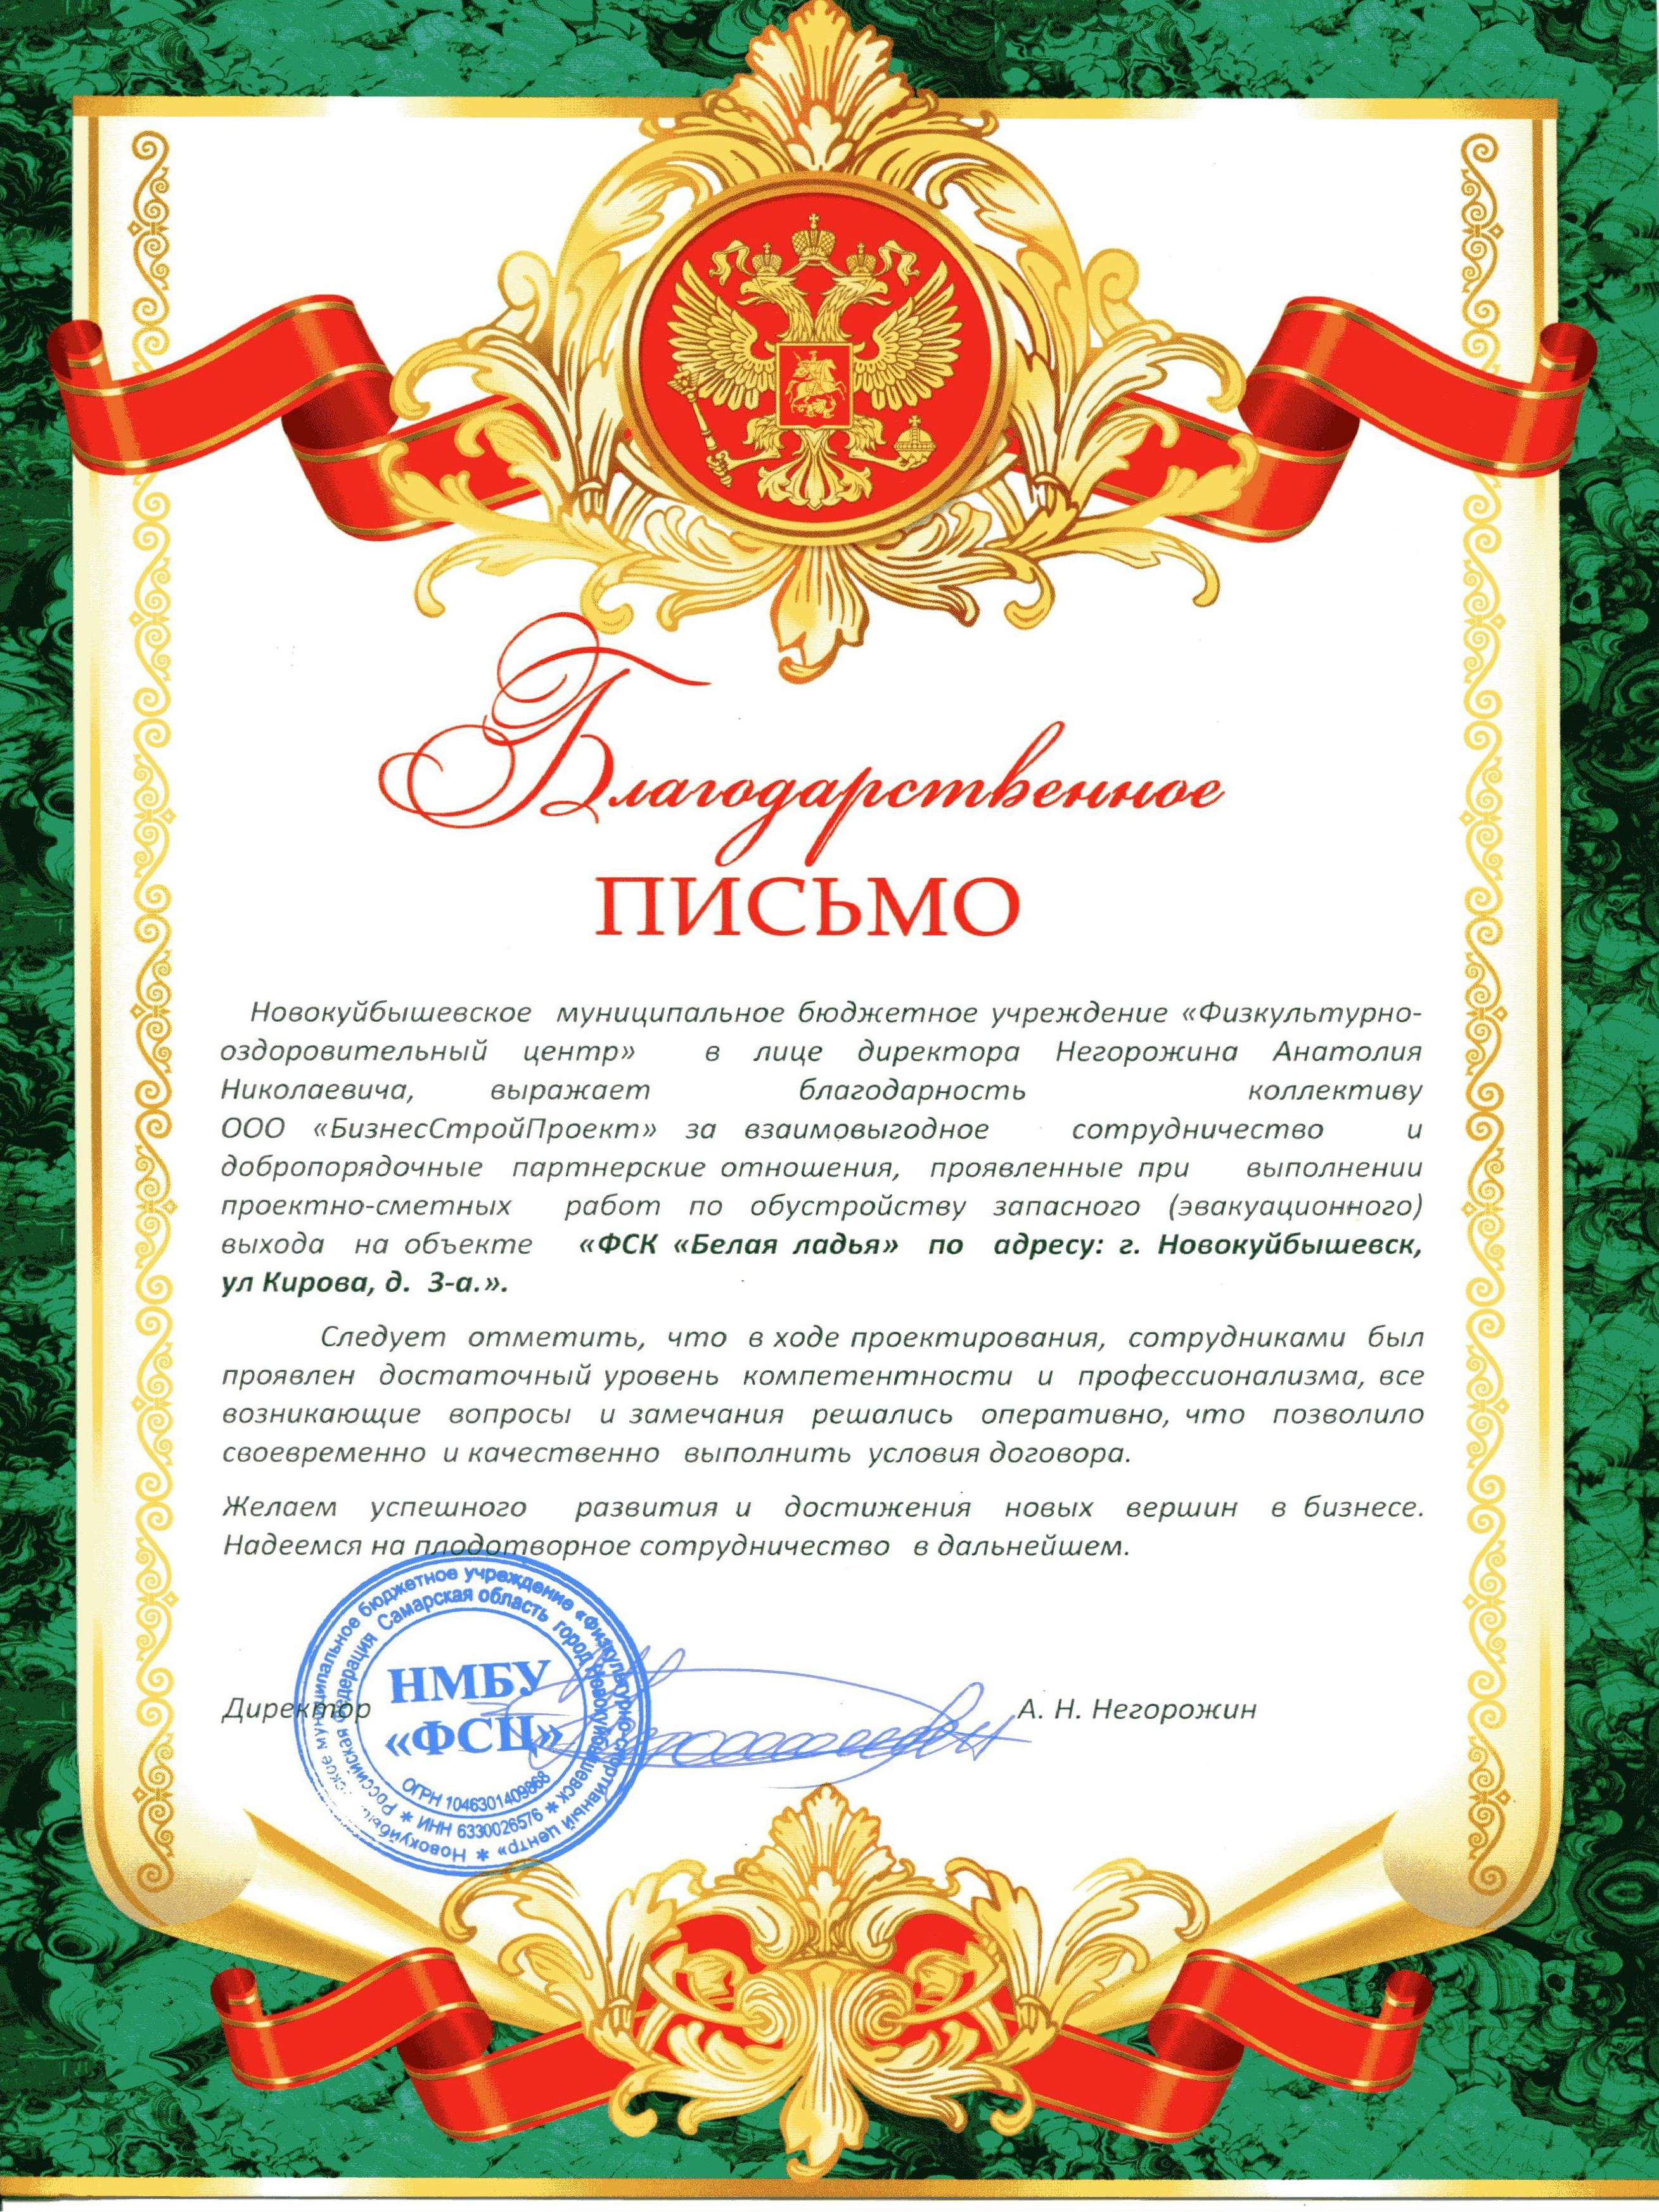 ФОК ФСК Белая ладья